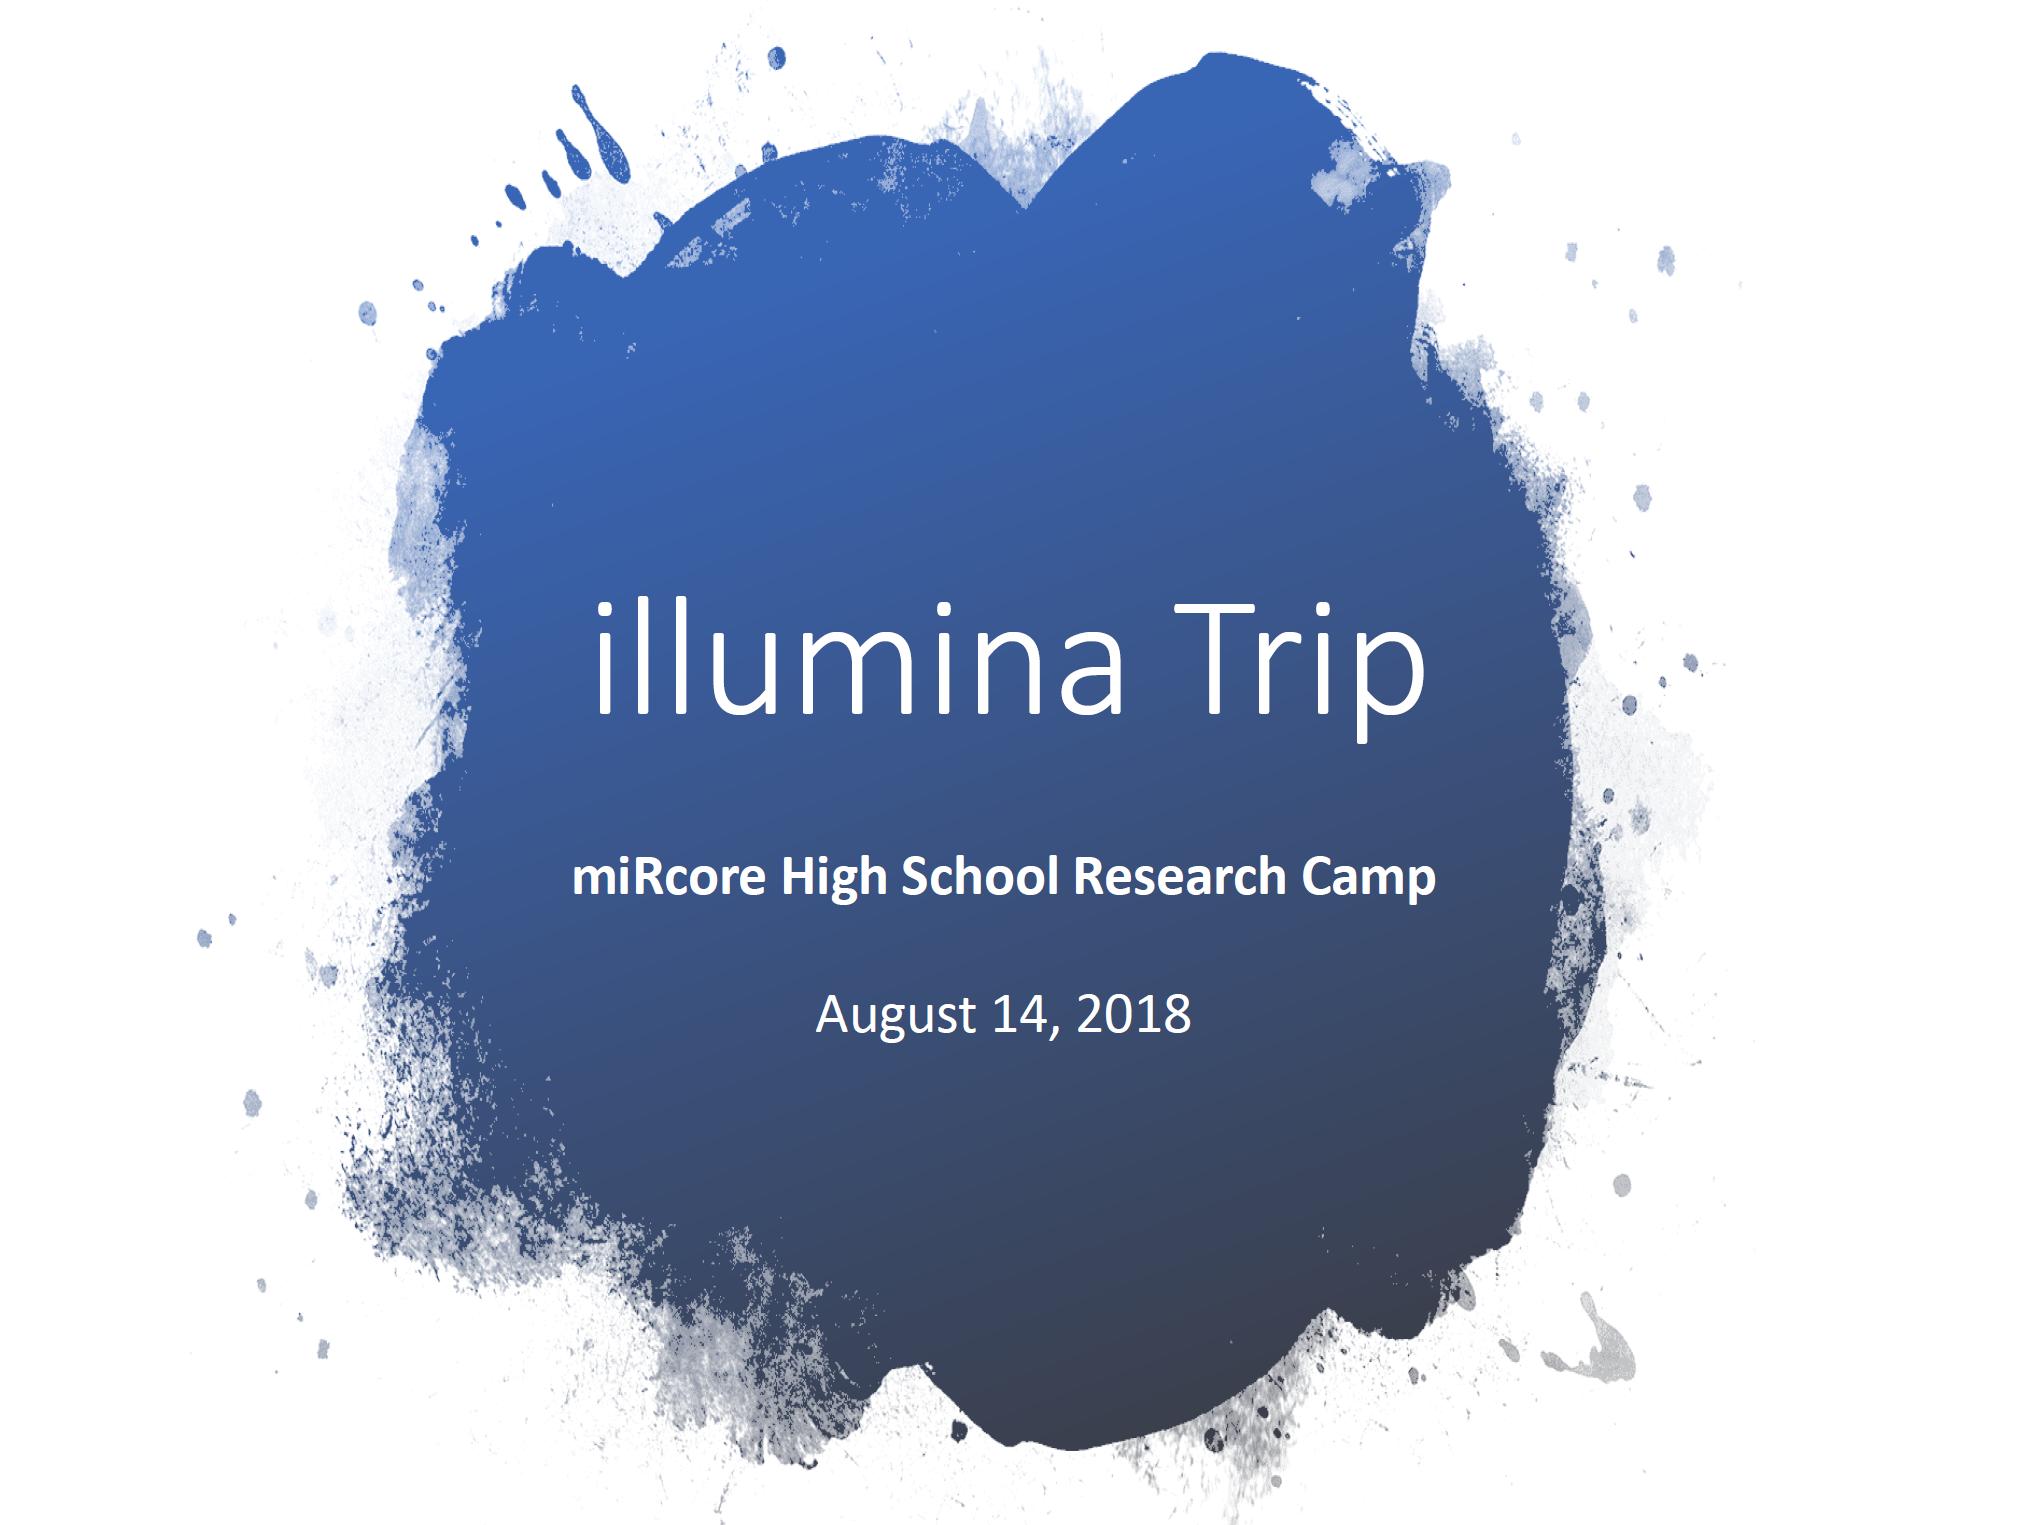 illumina trip1